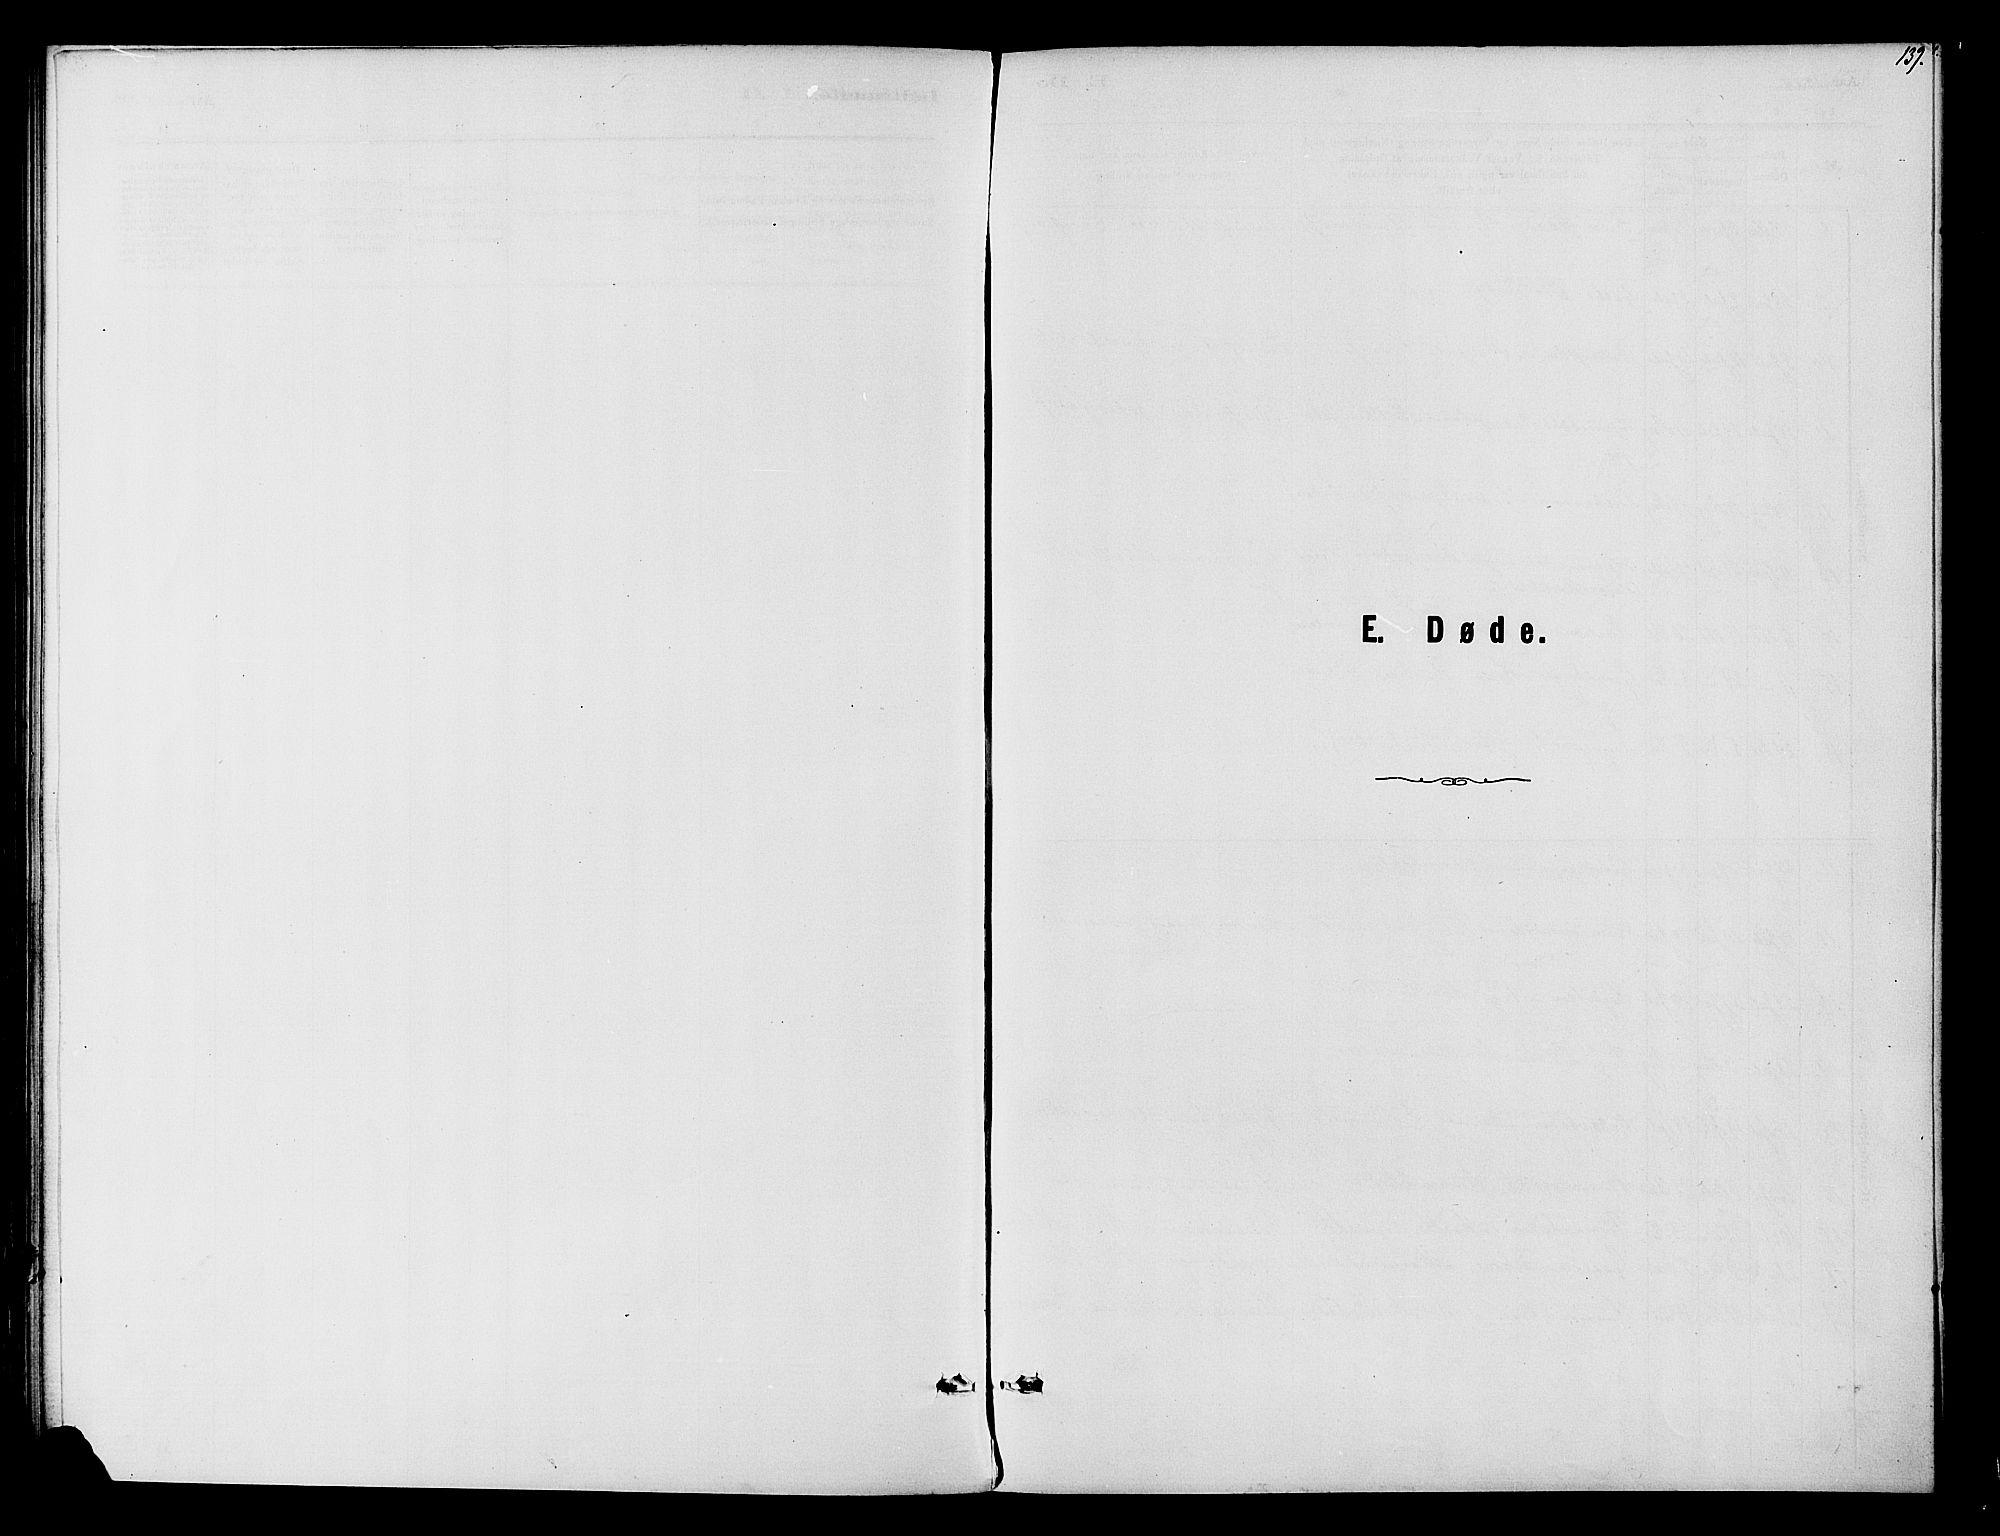 SAH, Vardal prestekontor, H/Ha/Haa/L0010: Ministerialbok nr. 10, 1878-1893, s. 139